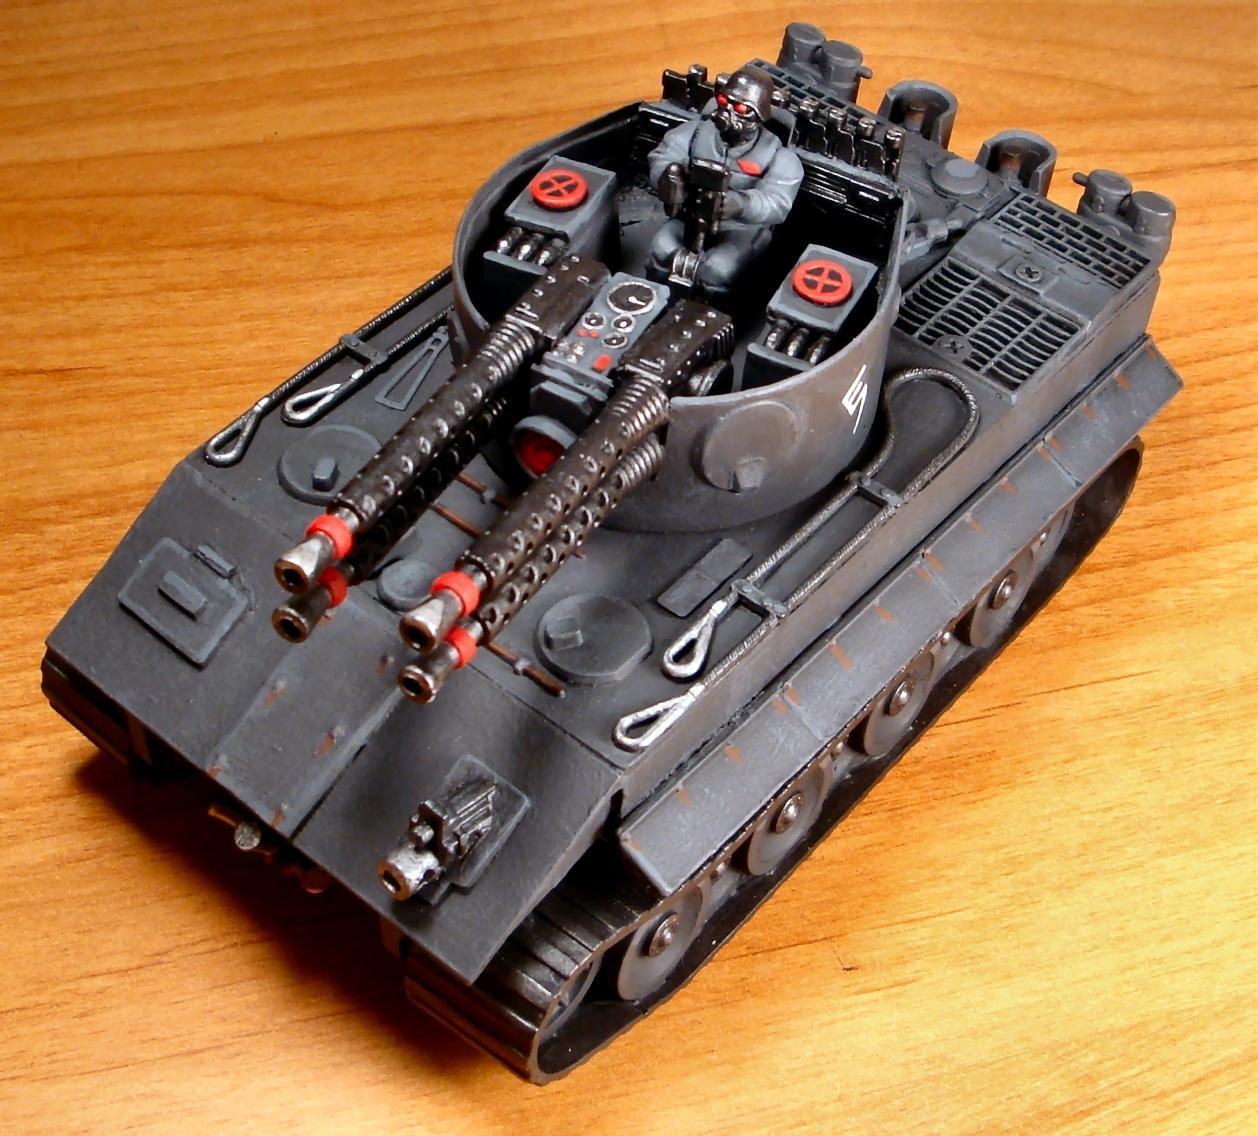 Do-it-yourself, Flak Tank, Hydra, Imperial Guard, Tiger I, Warhammer 40,000